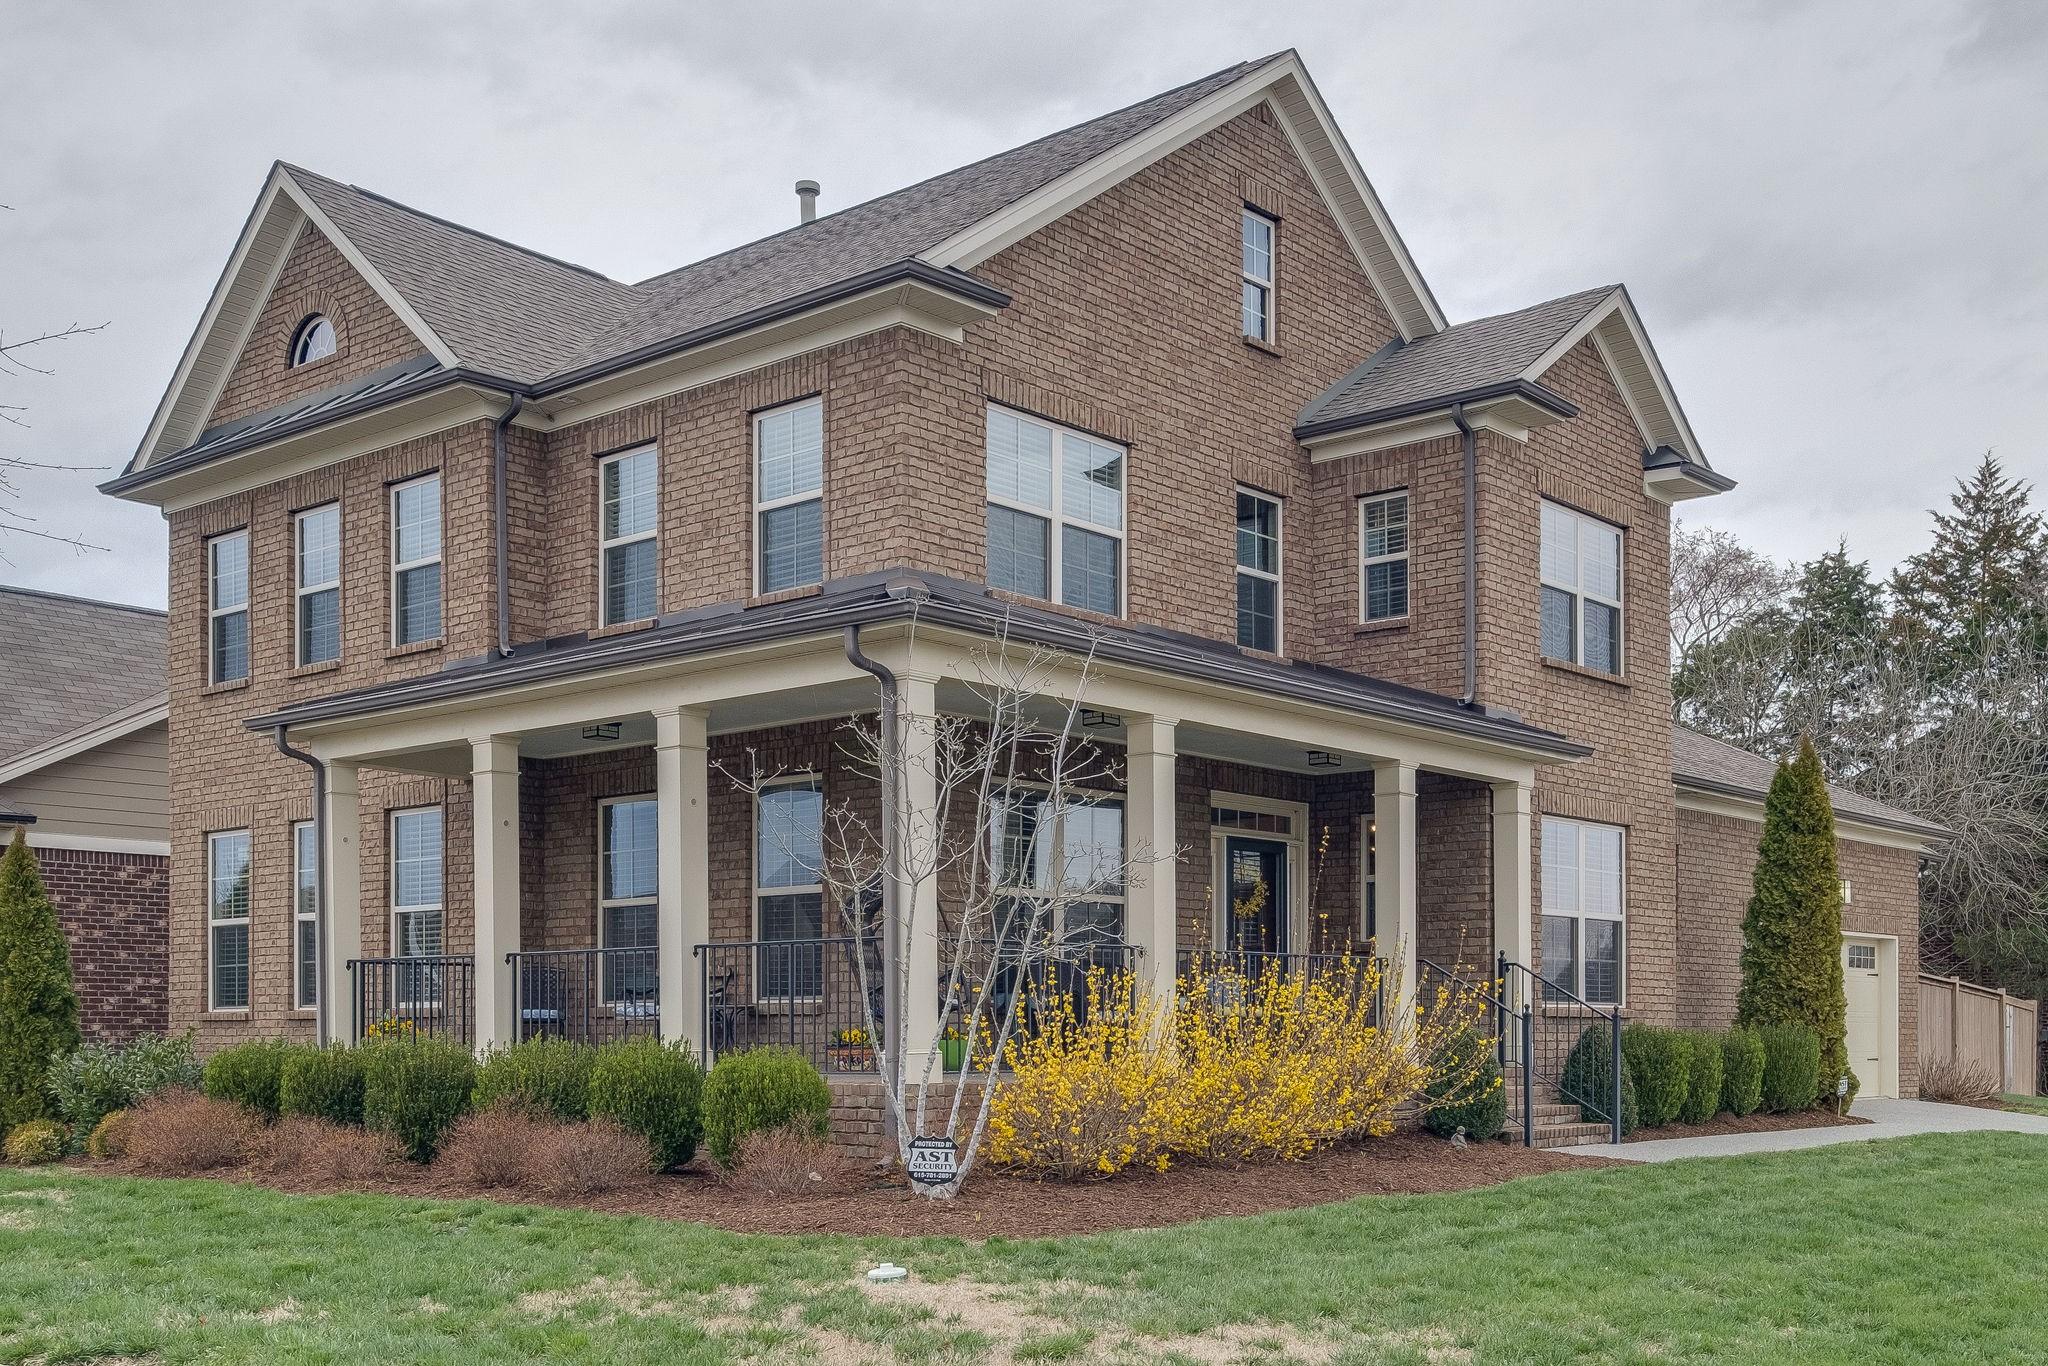 629 Westcott Ln, Nolensville, TN 37135 - Nolensville, TN real estate listing